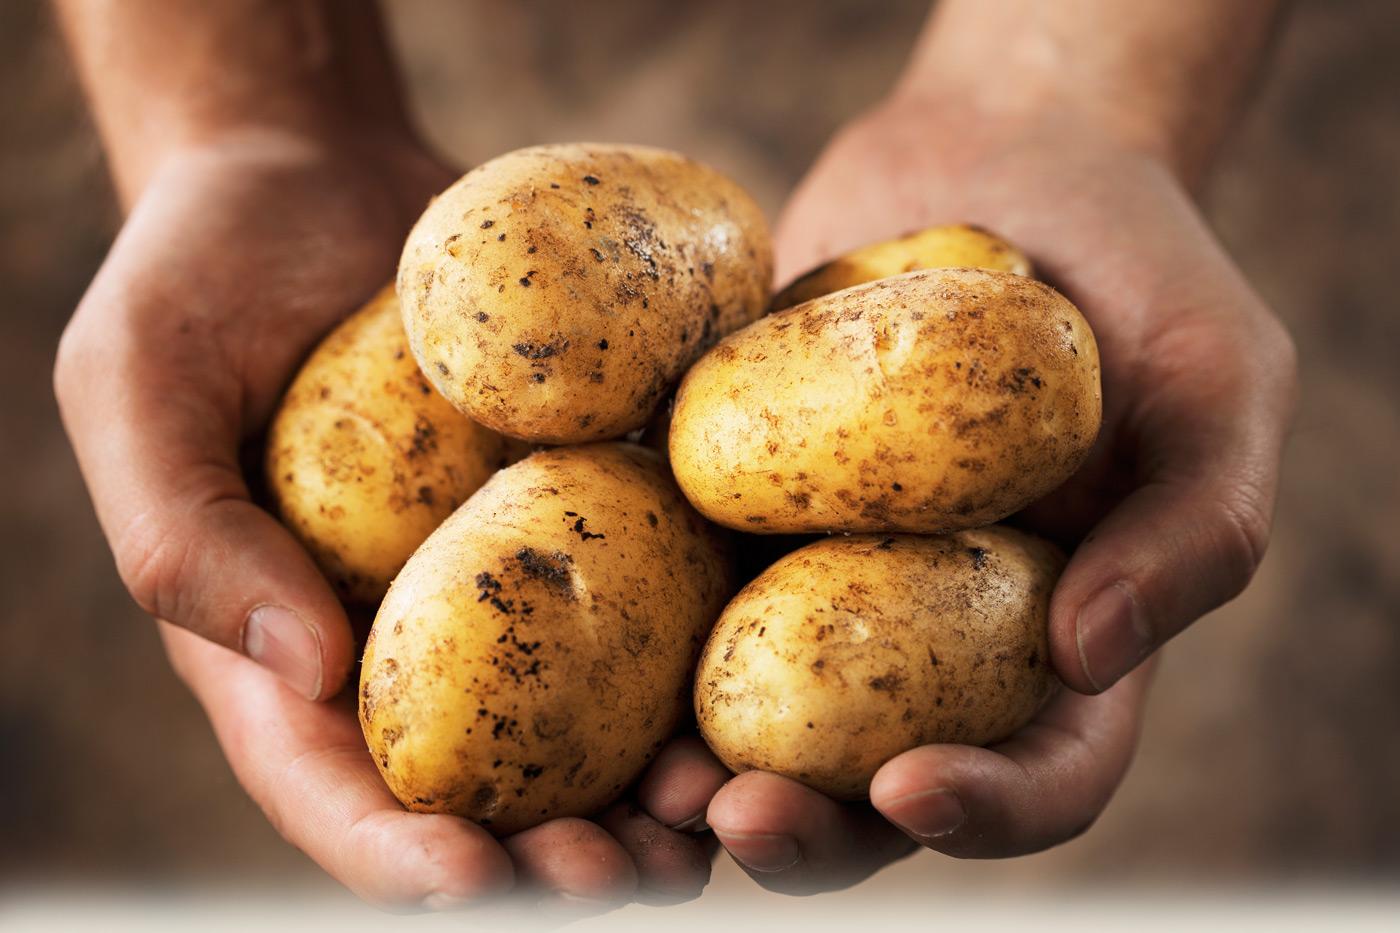 Nice Images Collection: Potato Desktop Wallpapers